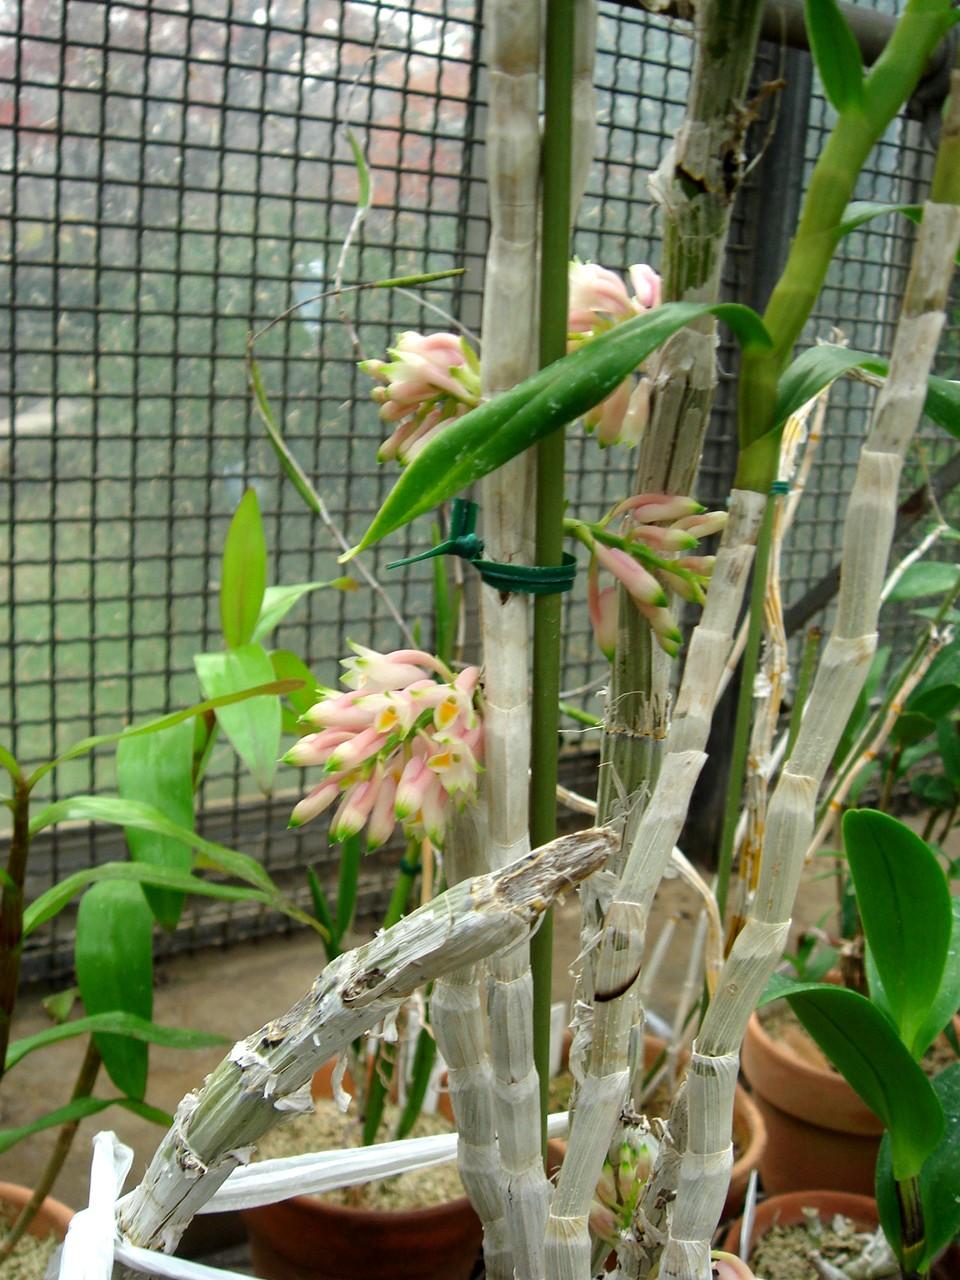 http://orchids.la.coocan.jp/Dendrobium/Dendrobium%20kraemeri/DSC05155.JPG